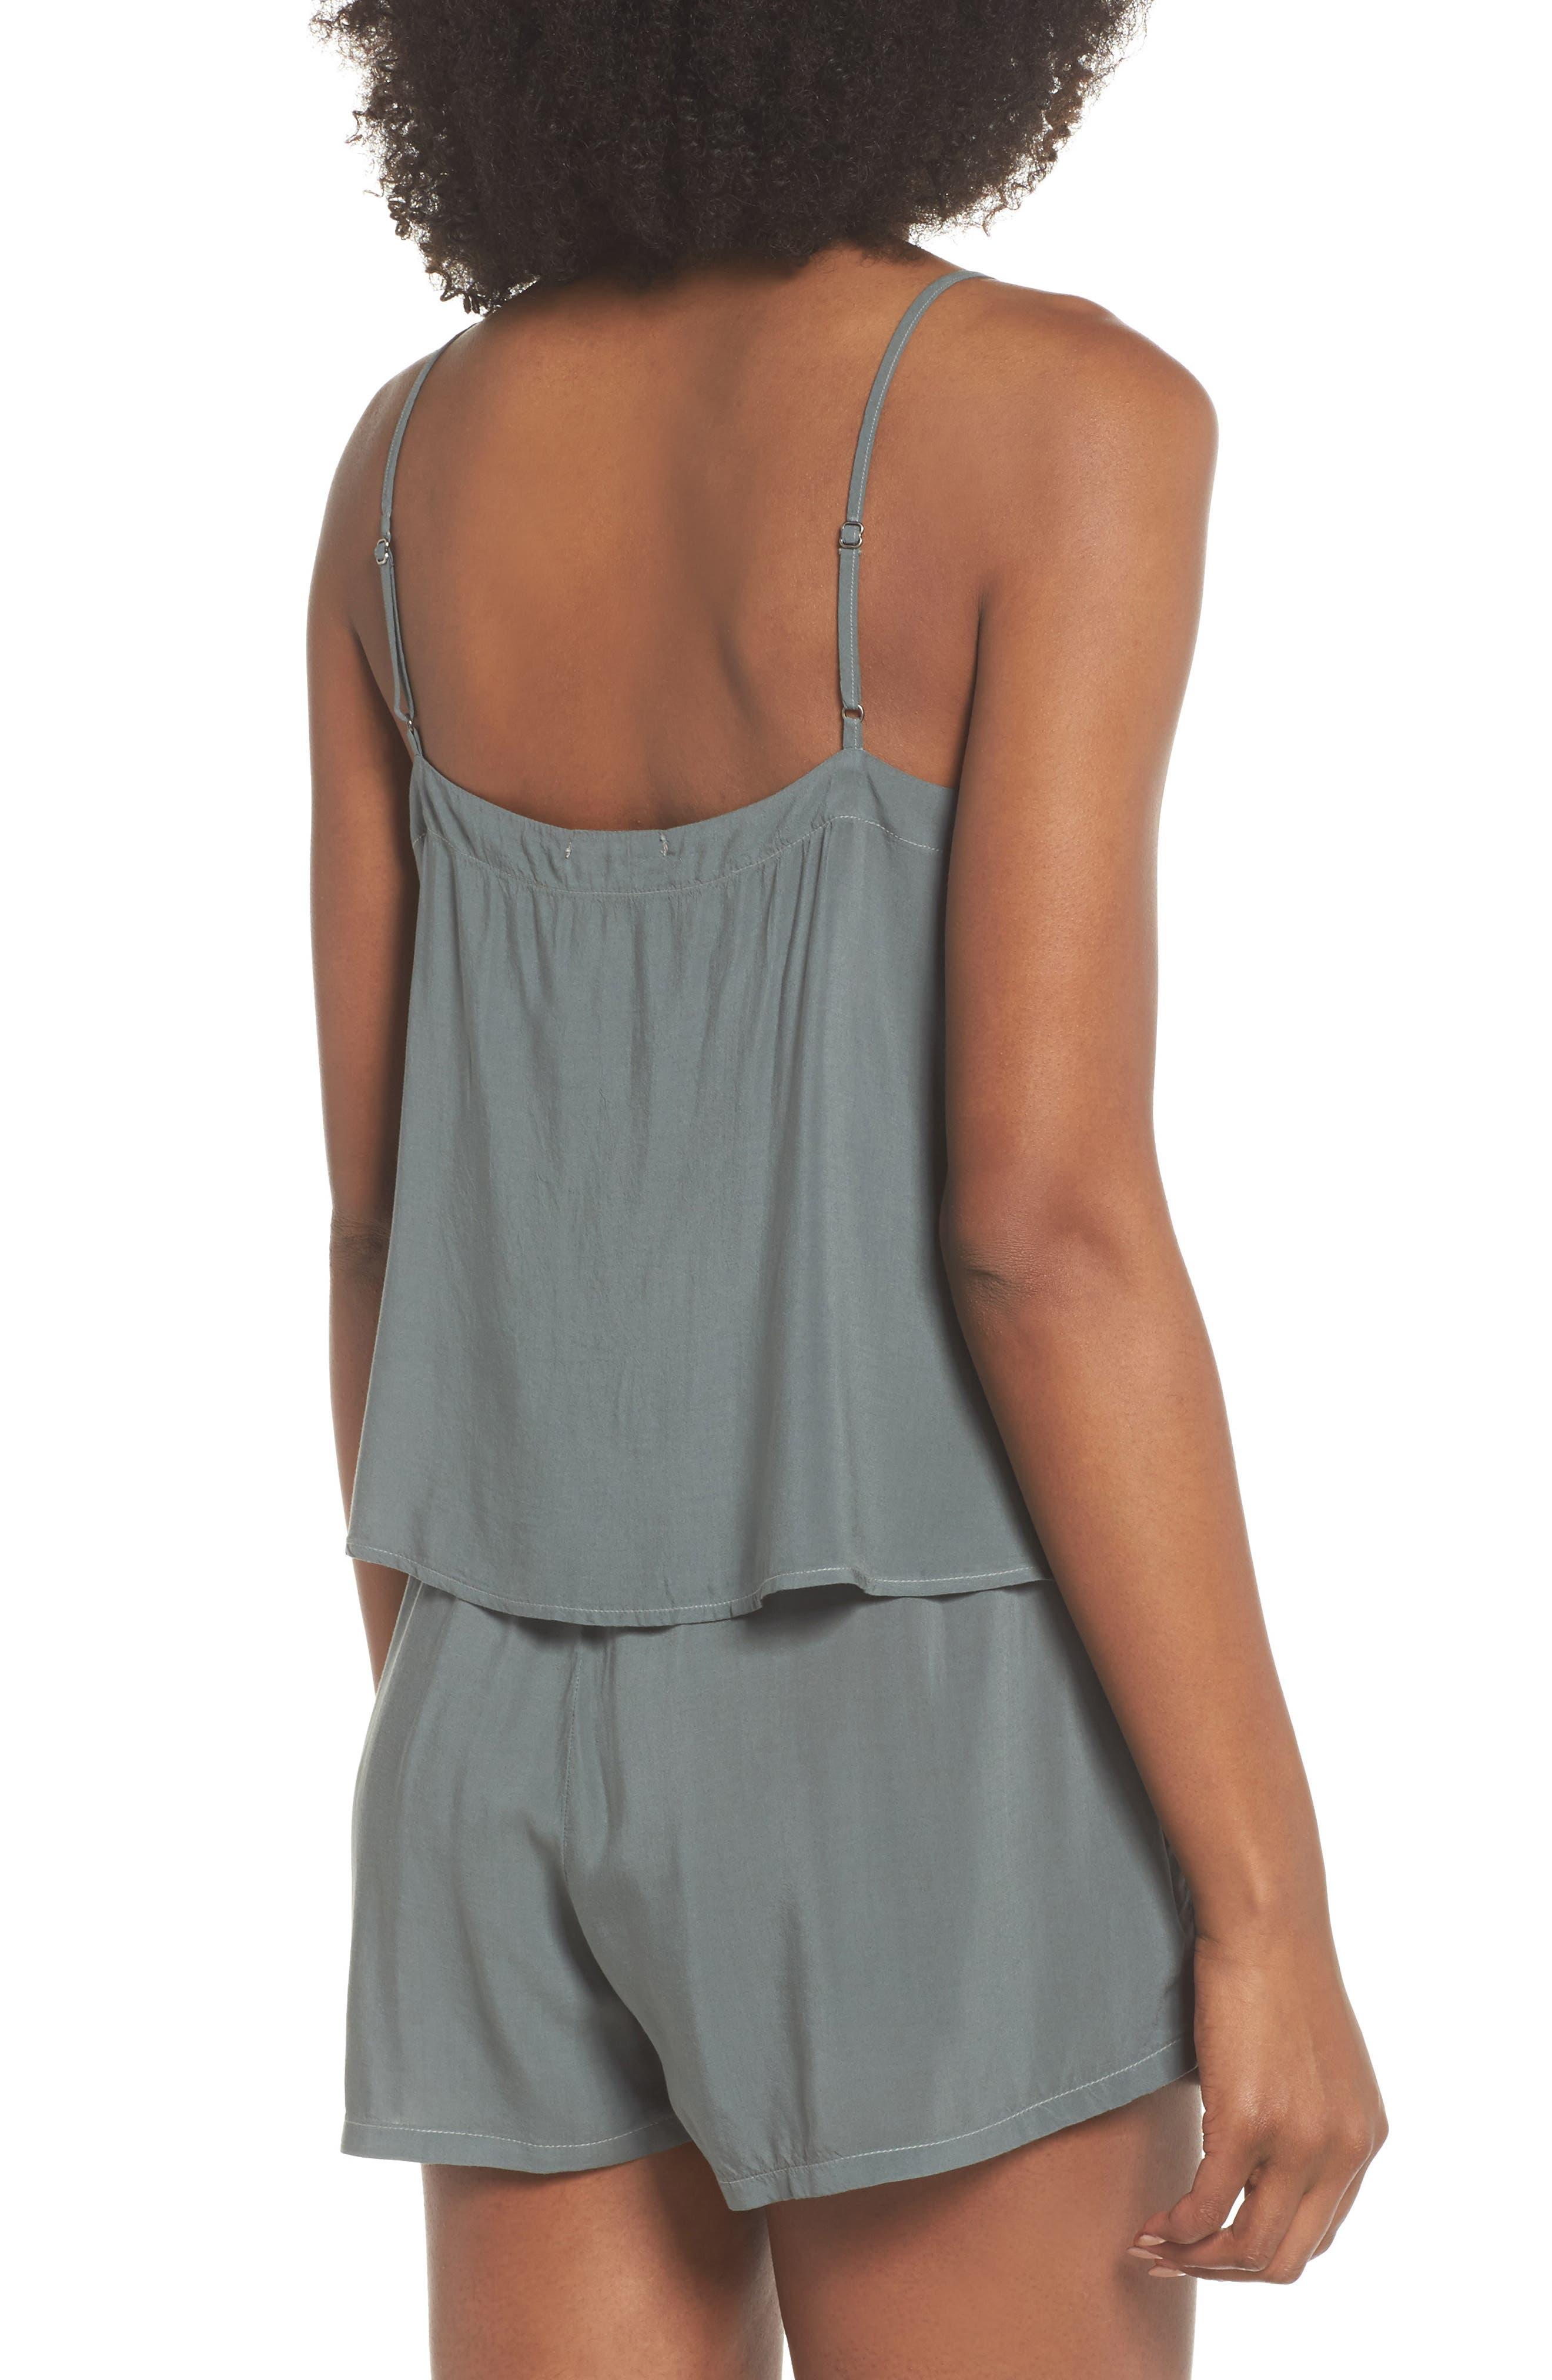 Poppy Short & Camisole Pajamas,                             Alternate thumbnail 2, color,                             440